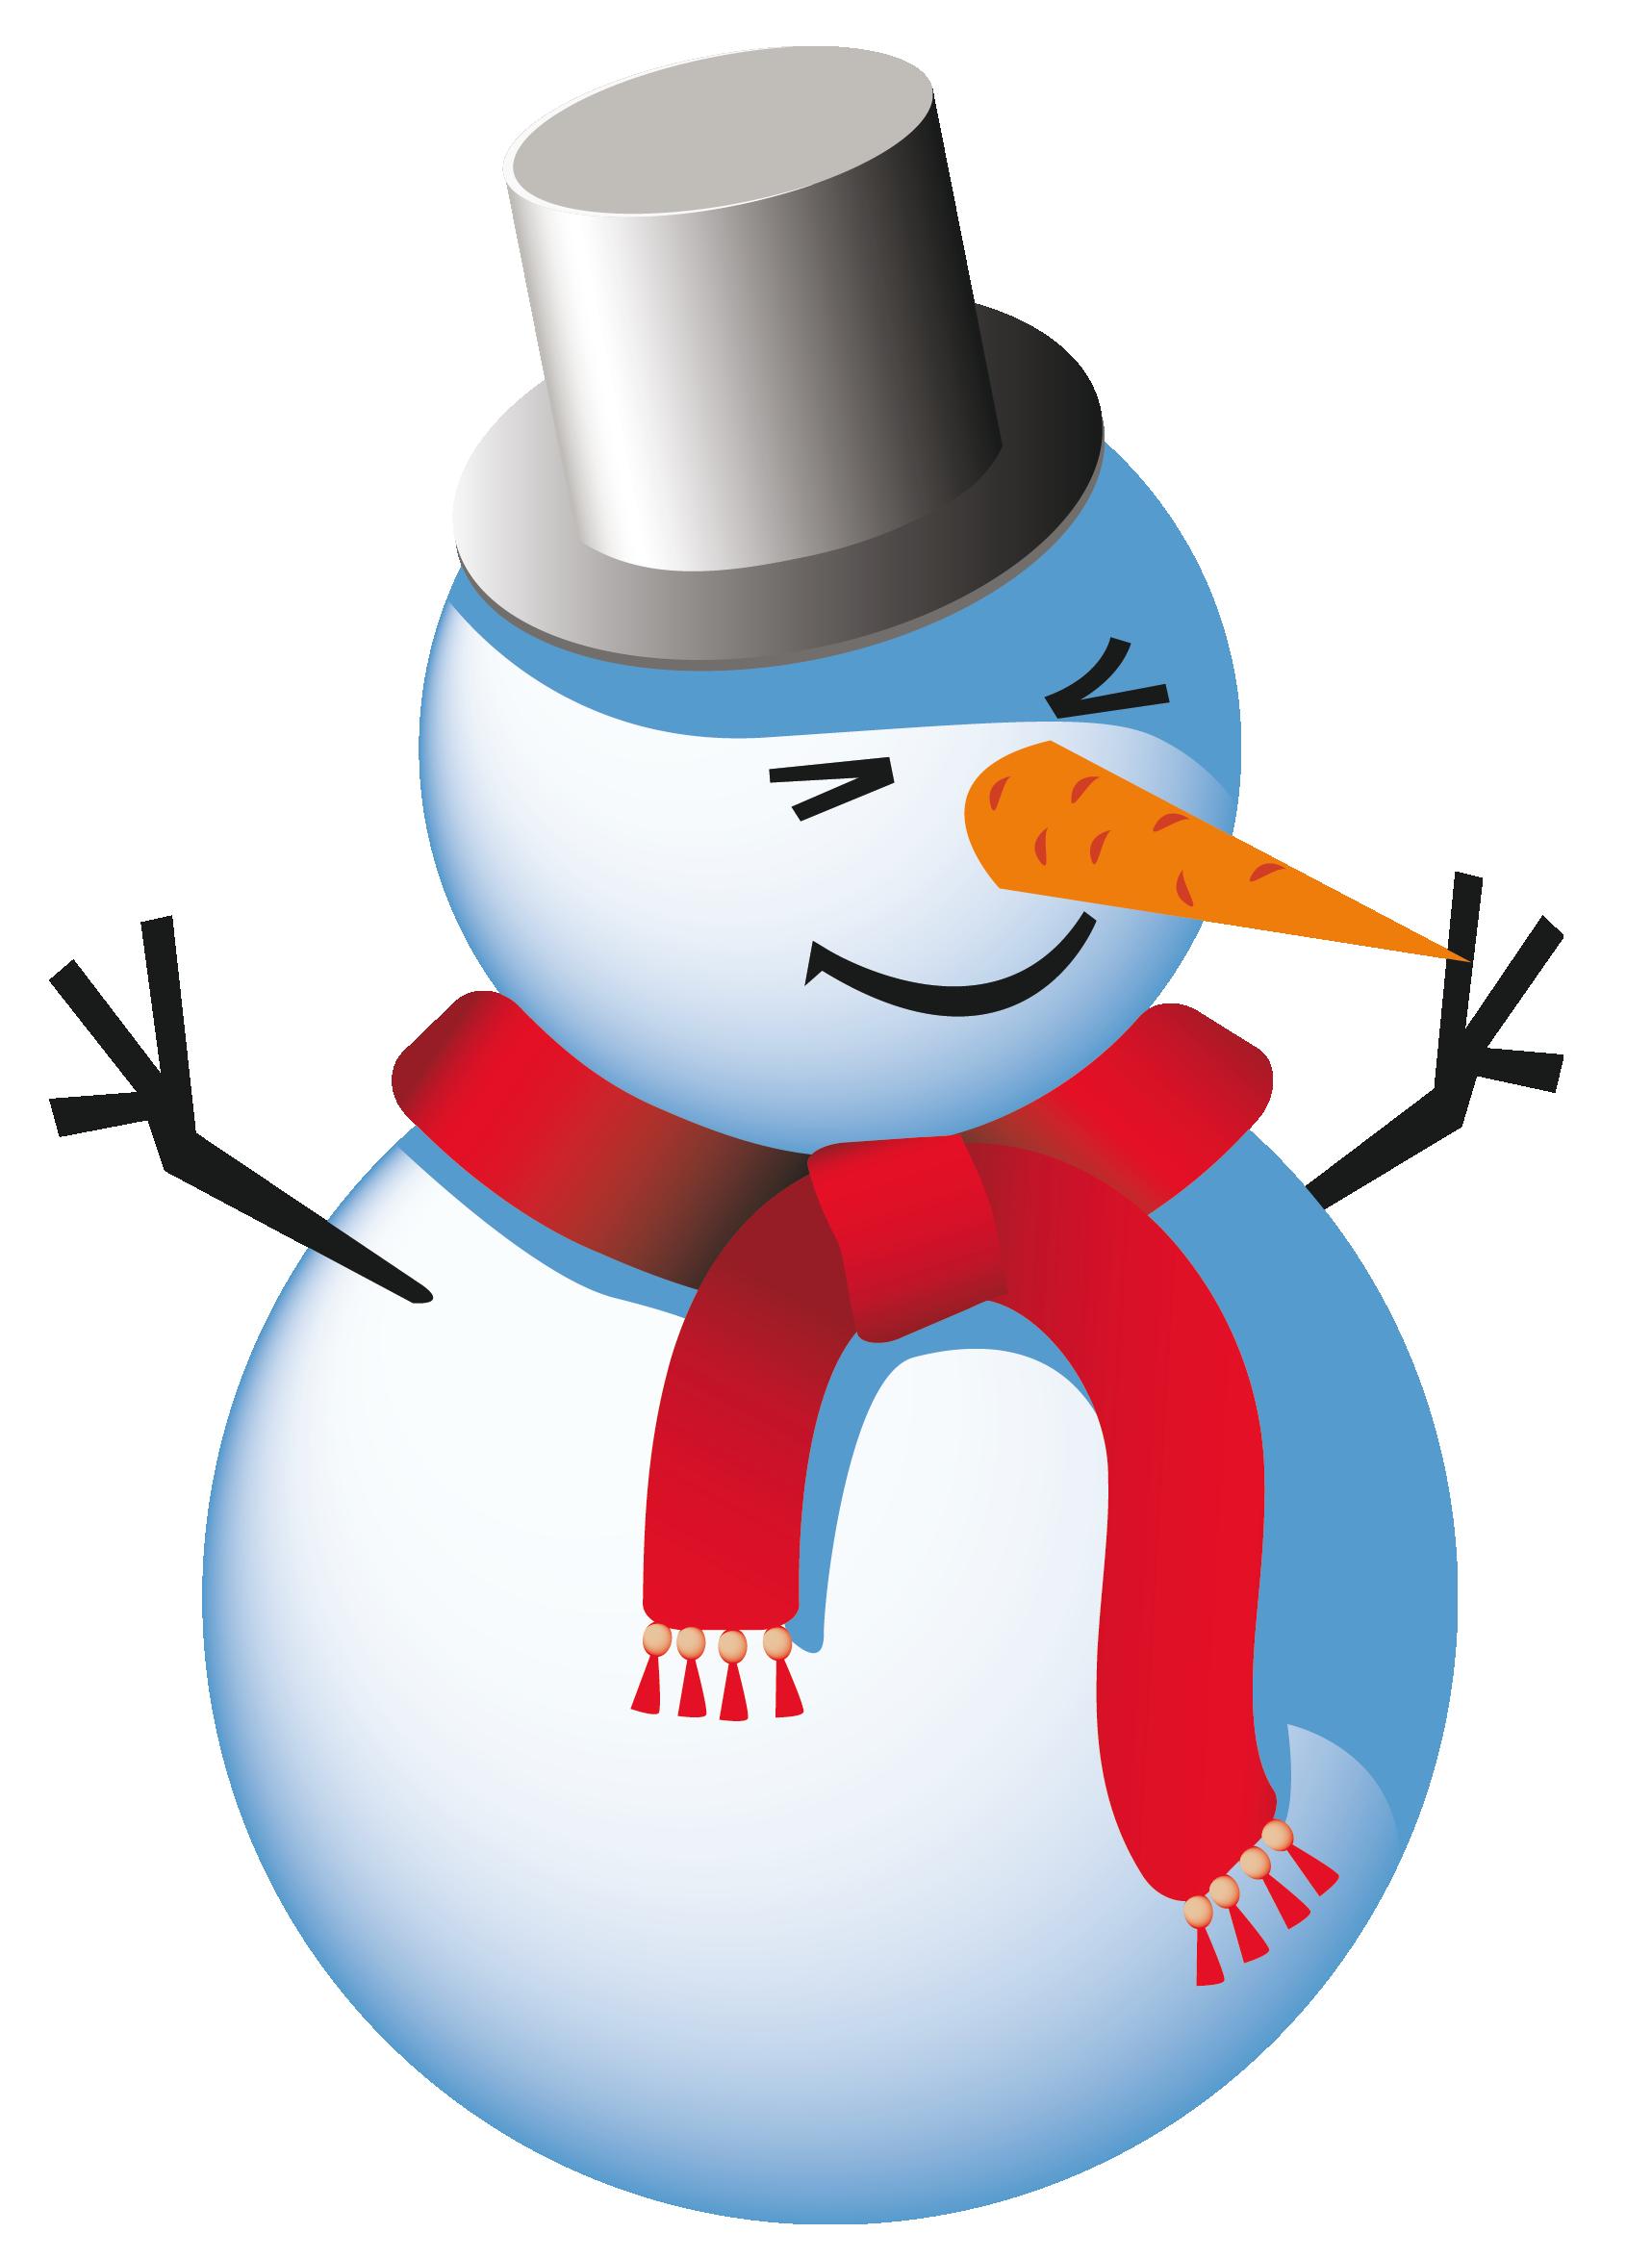 free vector clipart snowman - photo #26